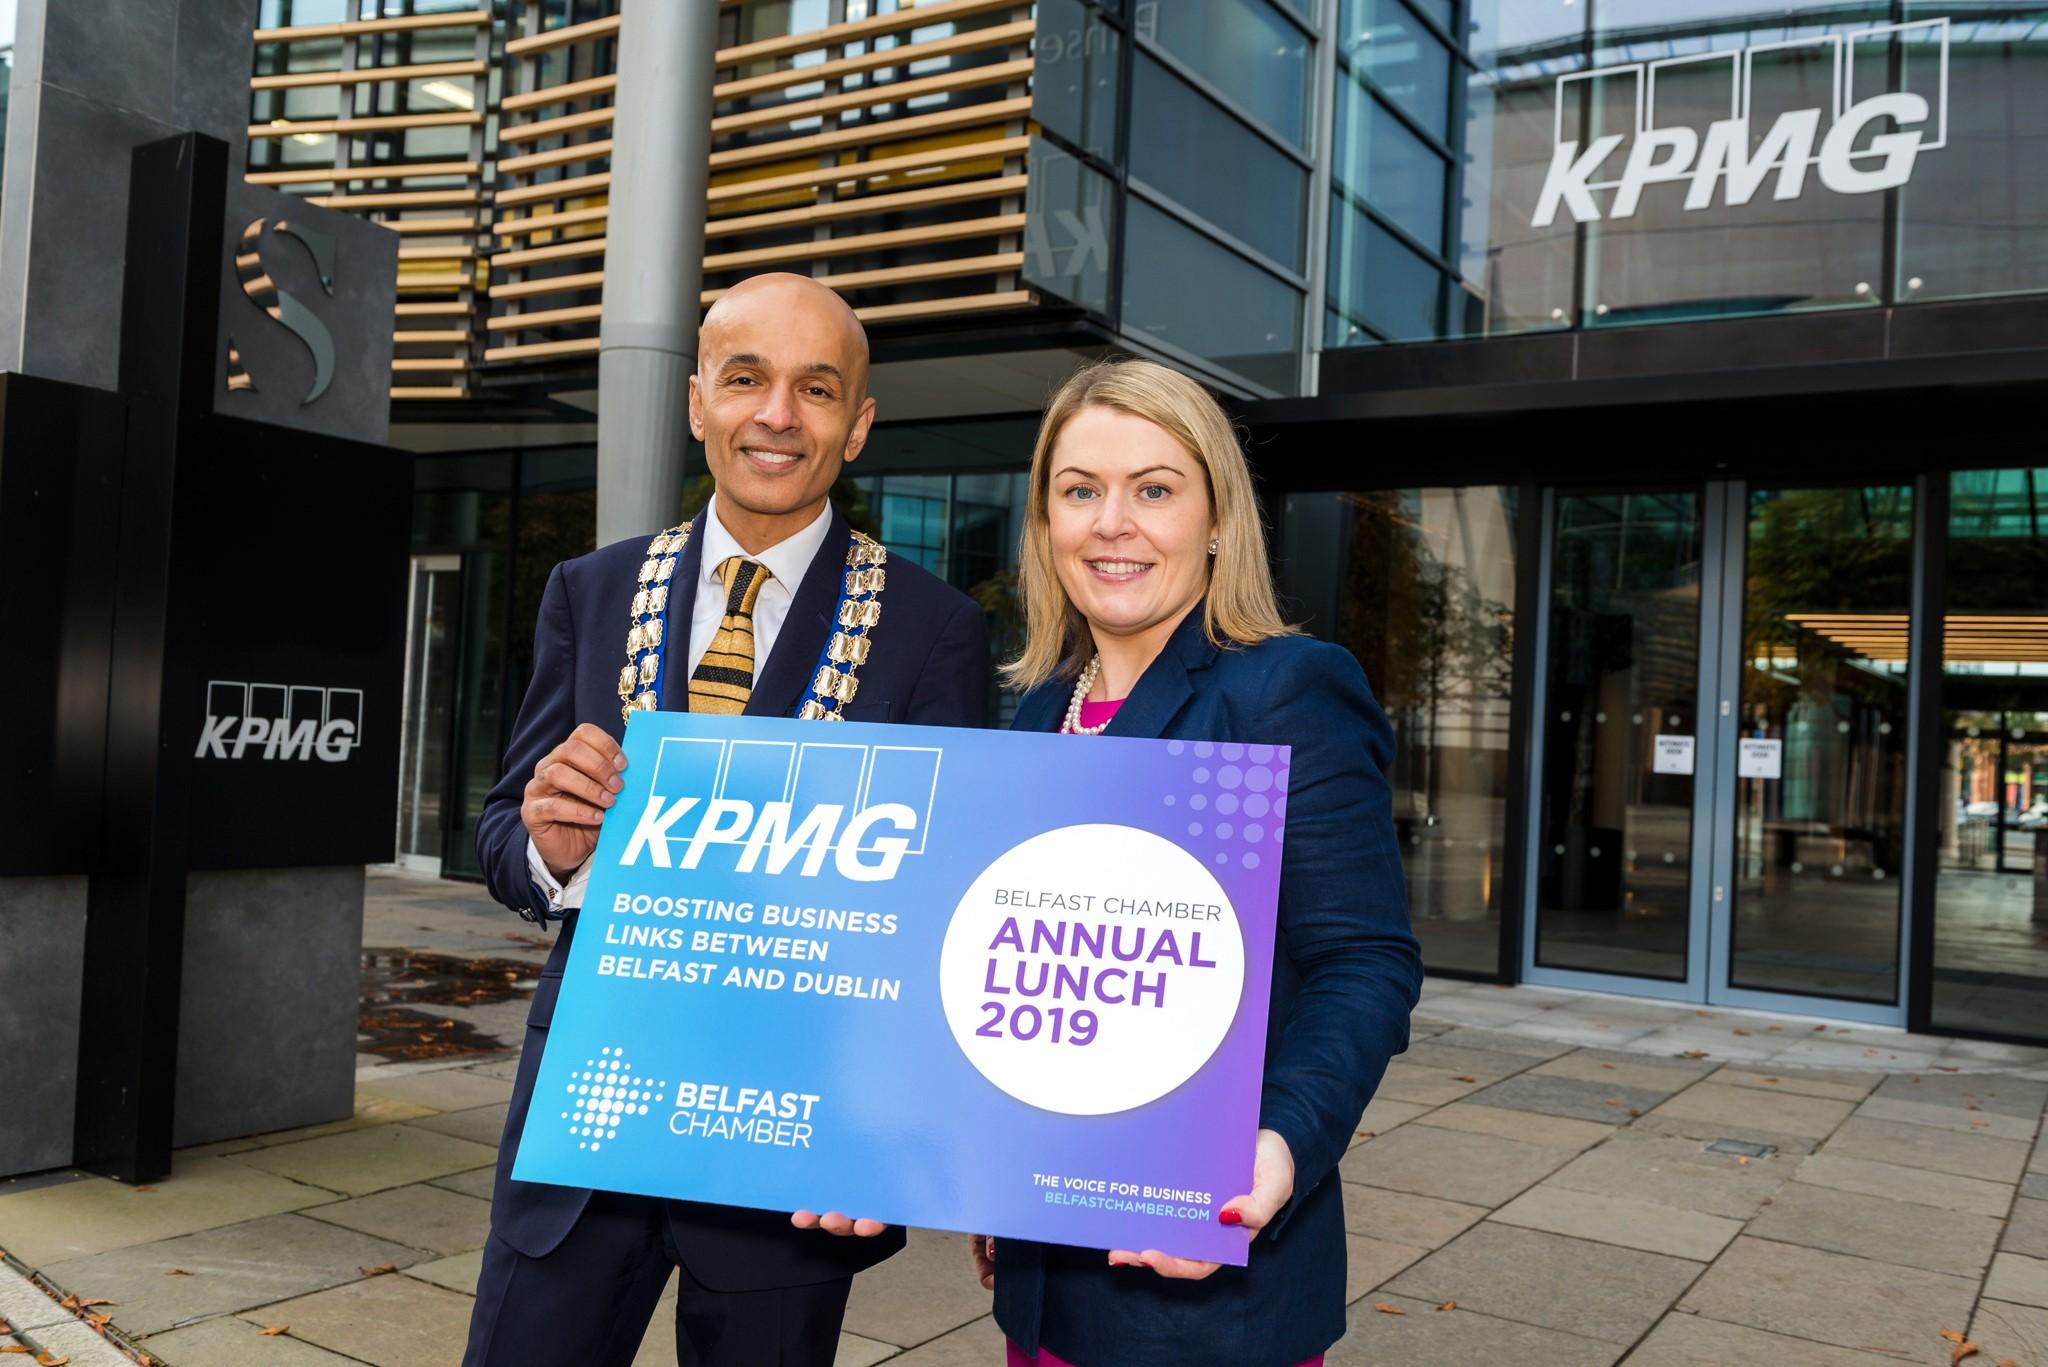 KPMG press release